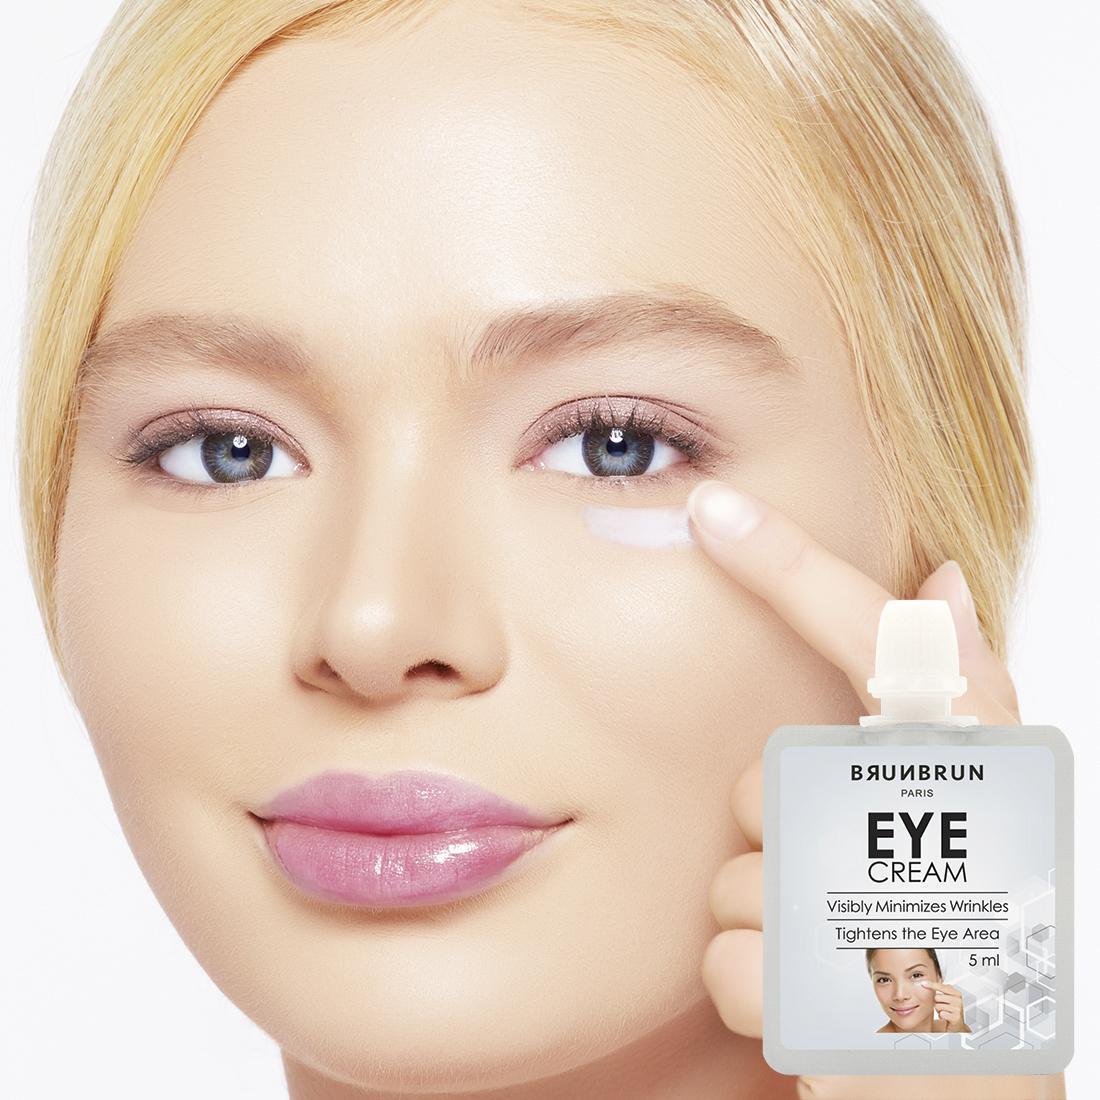 Krim Mata Masker Terbaik Alat Terapy I Care Brunbrun Paris Eye Cream